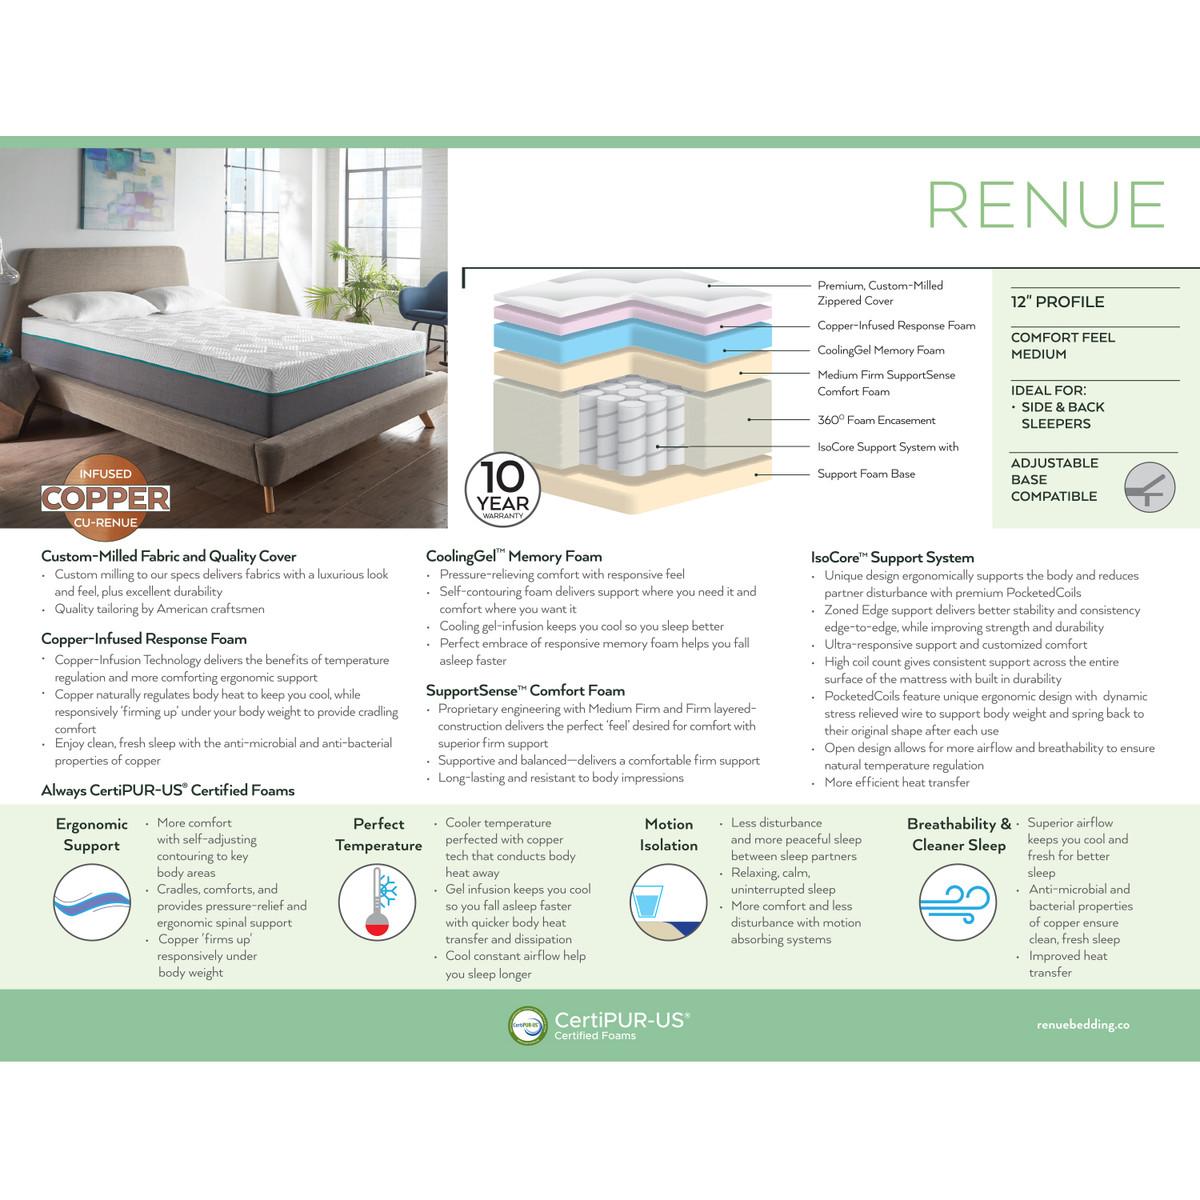 Renue Twelve Inch Hybrid Mattress and Box